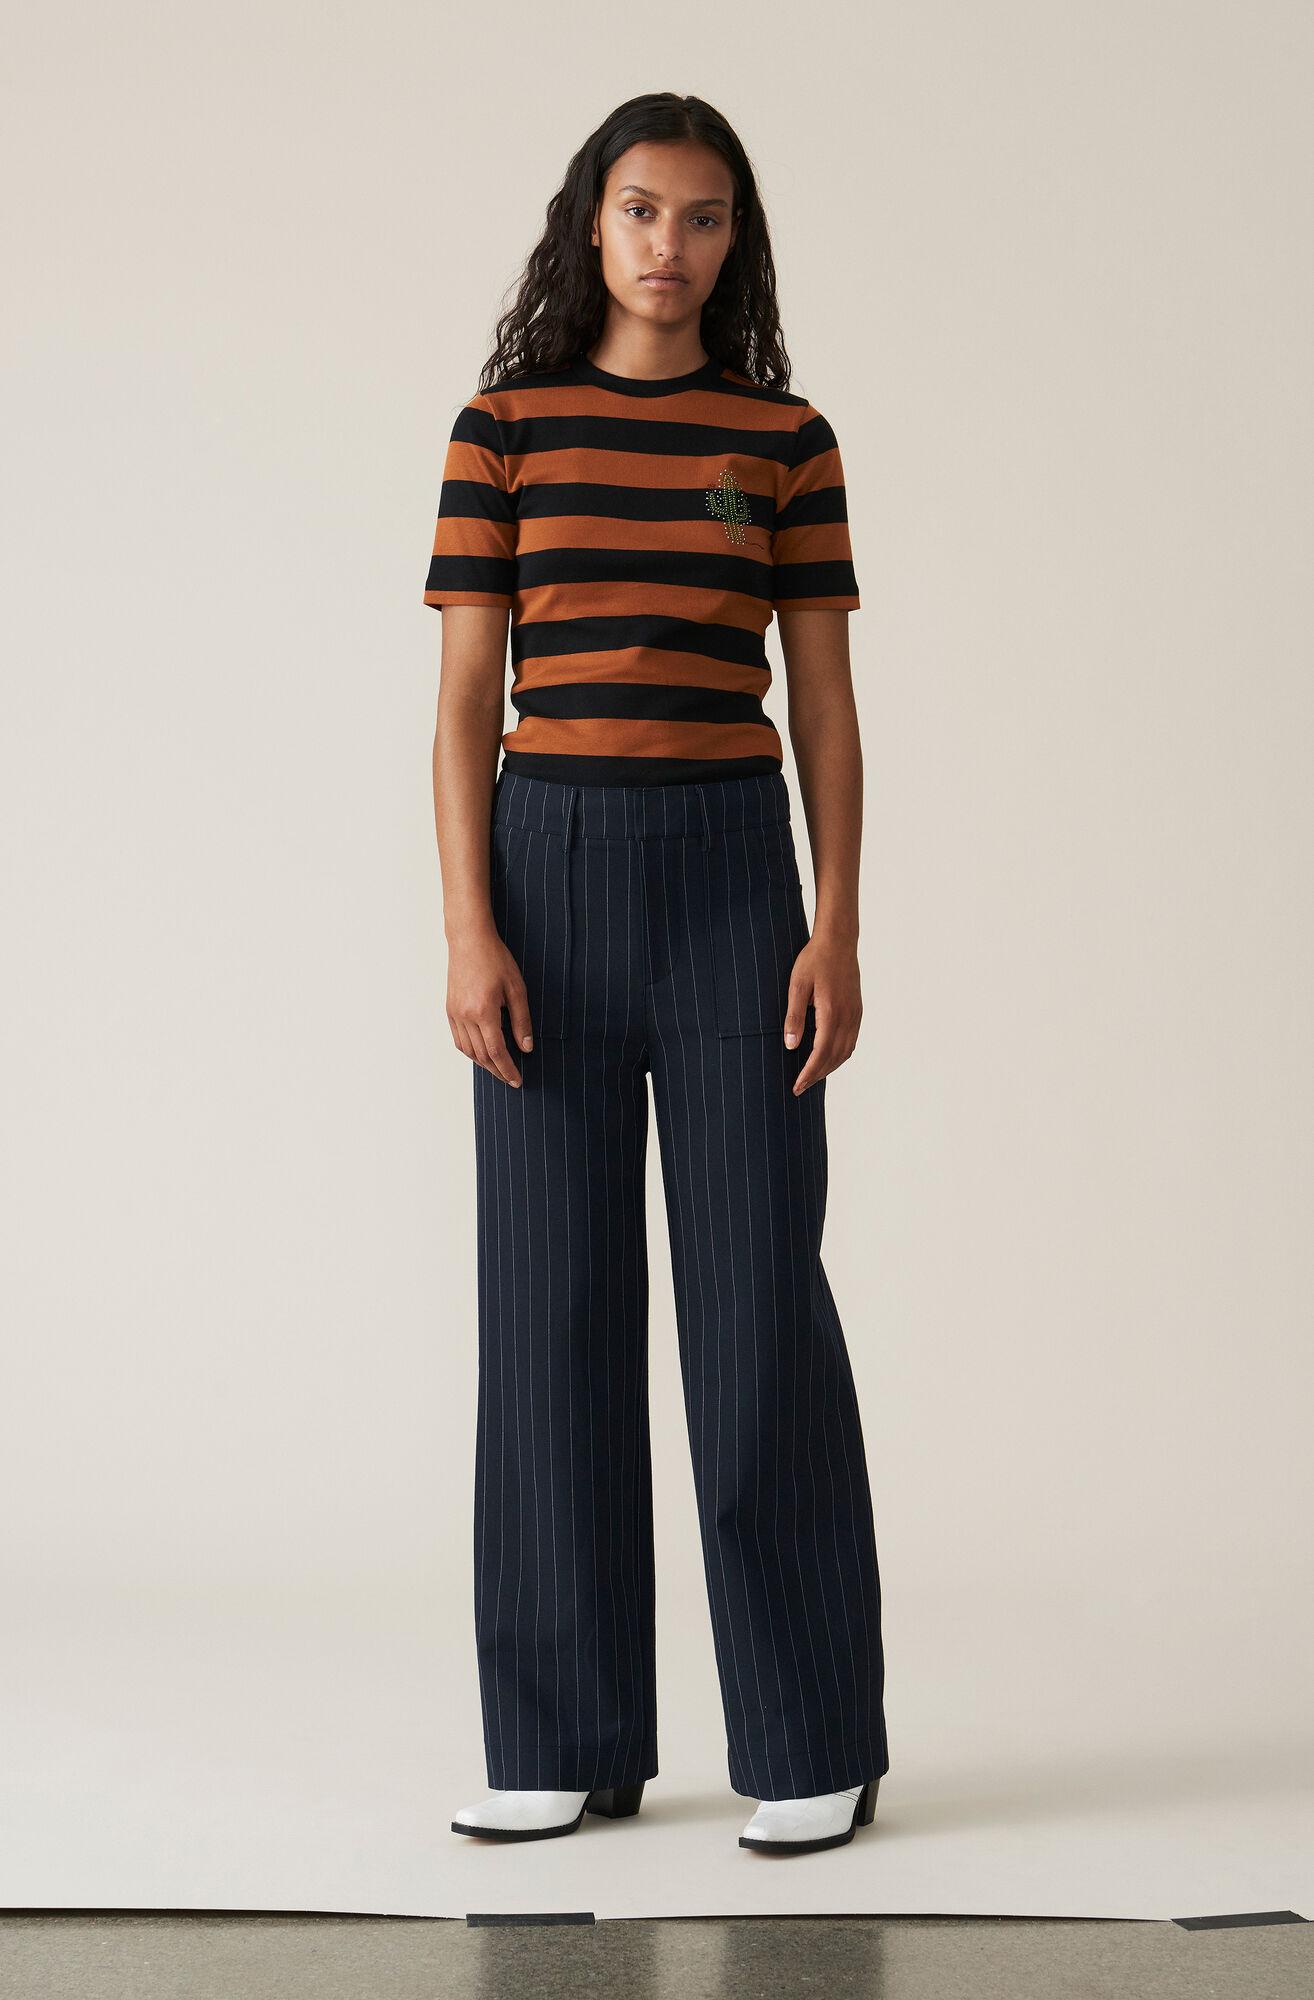 Stripe Rib T-shirt, Cactus, Caramel Café, hi-res